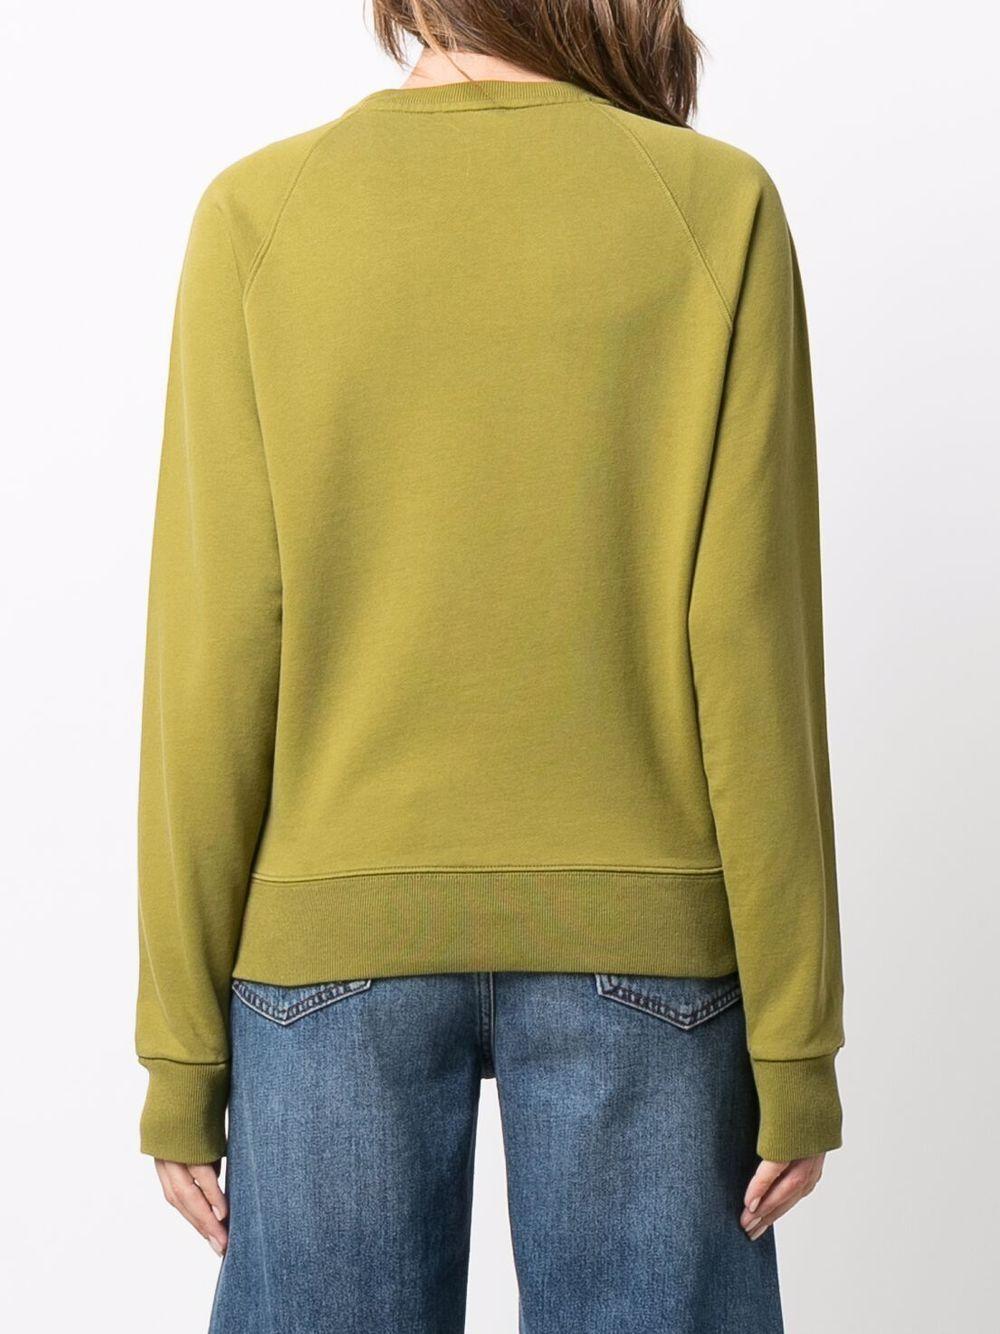 logo sweatshirt unisex avocado in cotton MAISON KITSUNÉ | Sweatshirts | HW00315KM0001P356